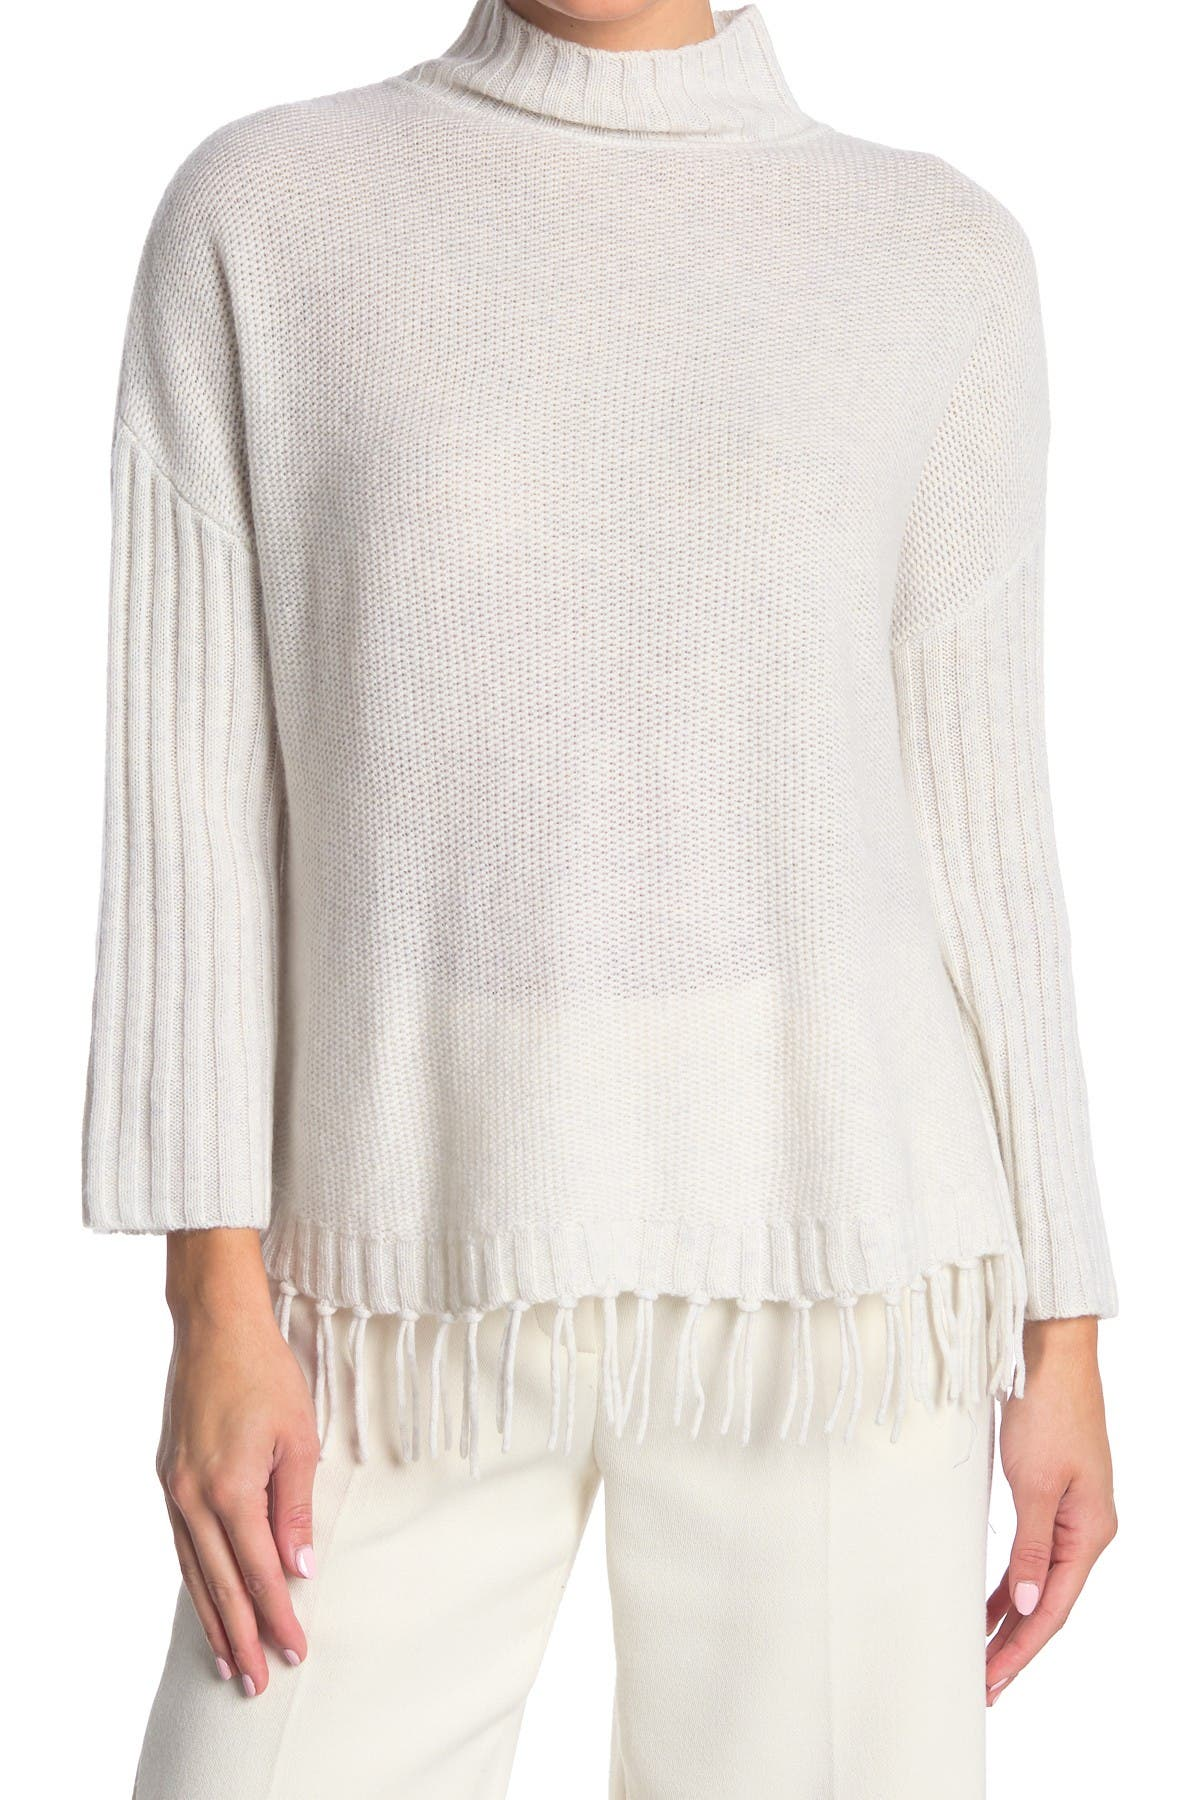 Image of Kinross Fringe Trim Cashmere Sweater